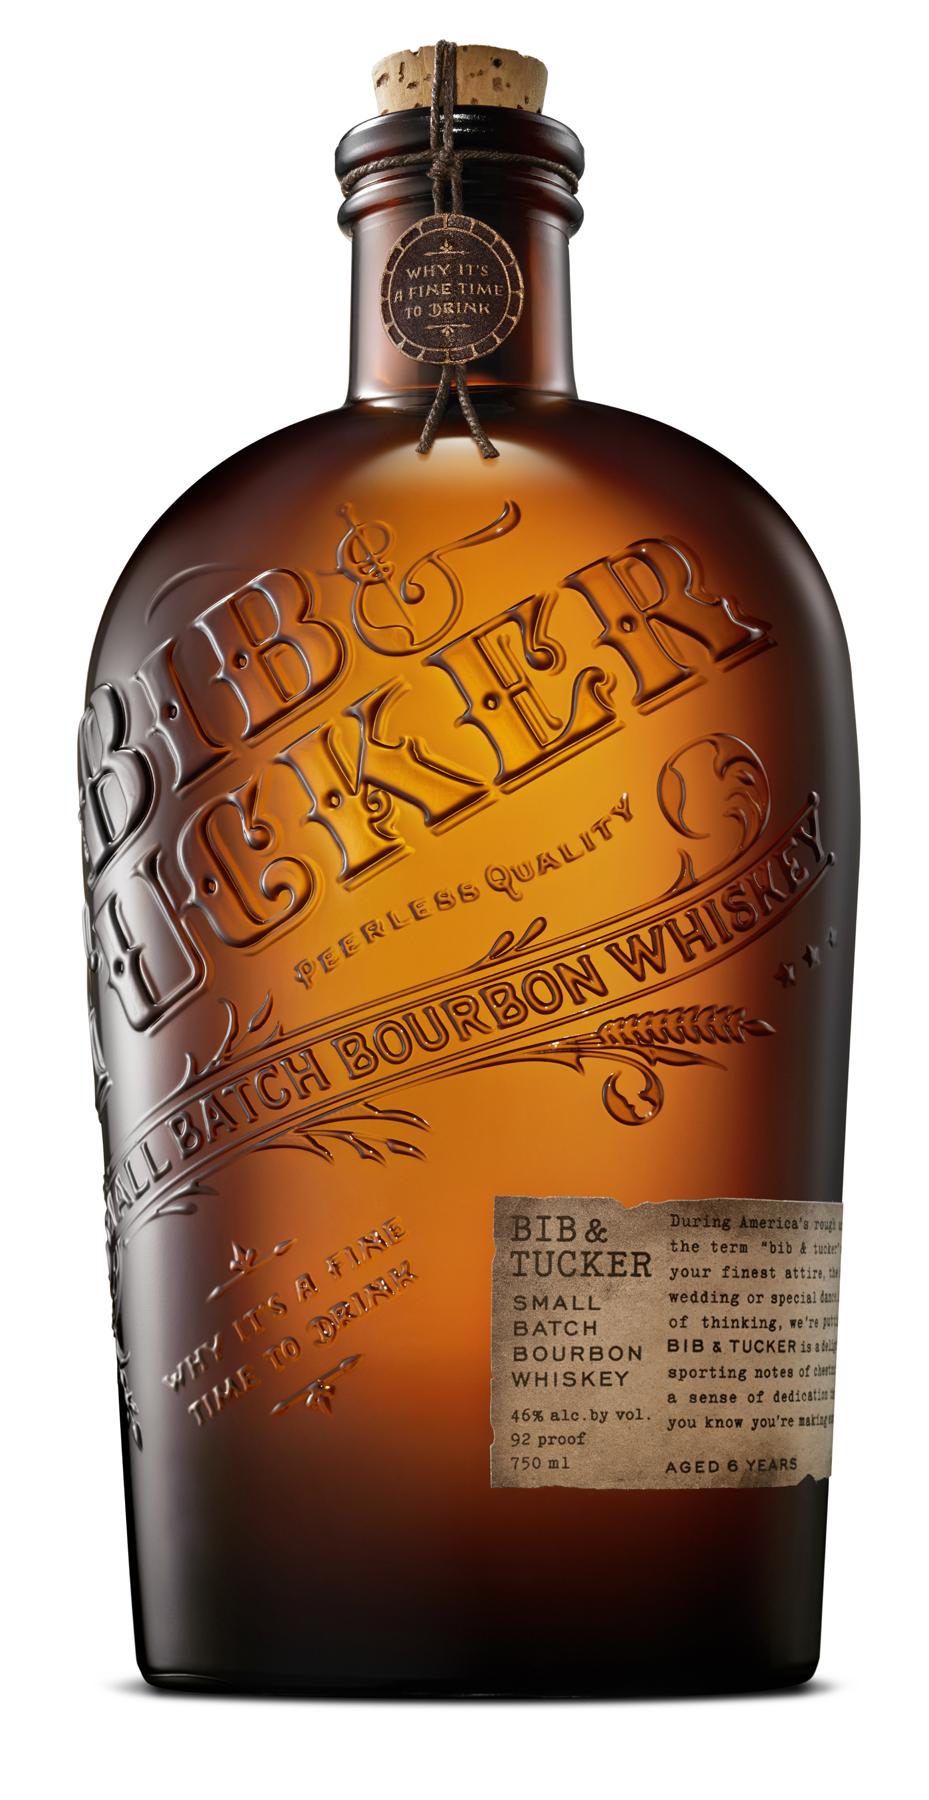 Bib & Tucker Small Batch Bourbon 6 Years Old